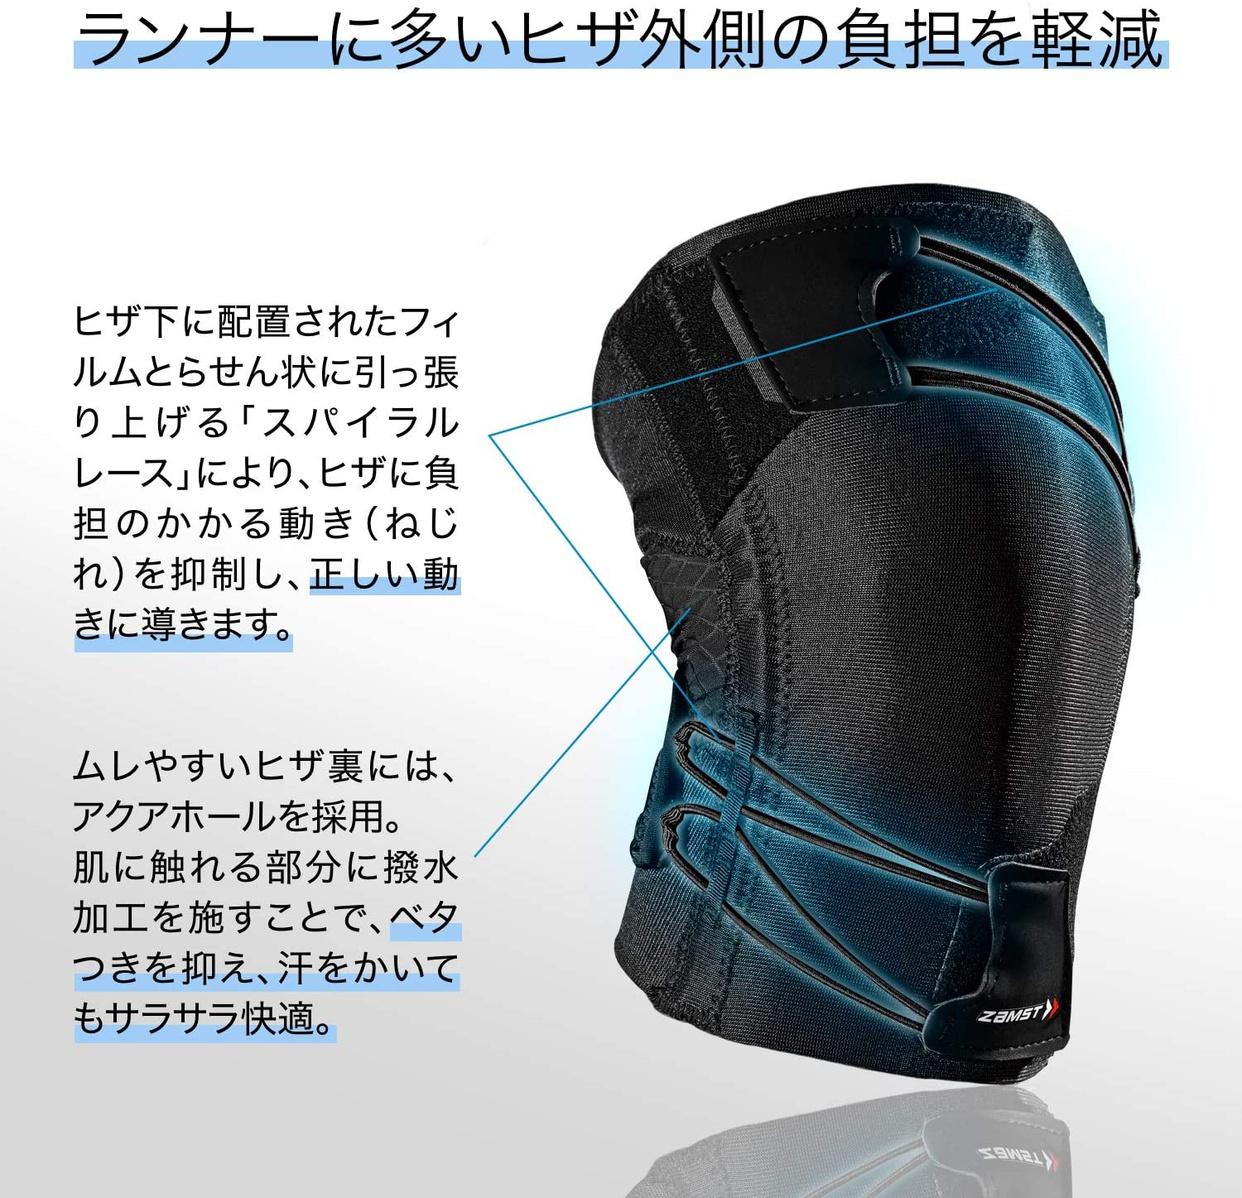 ZAMST(ザムスト) 膝用サポーター RK-1Plusの商品画像3